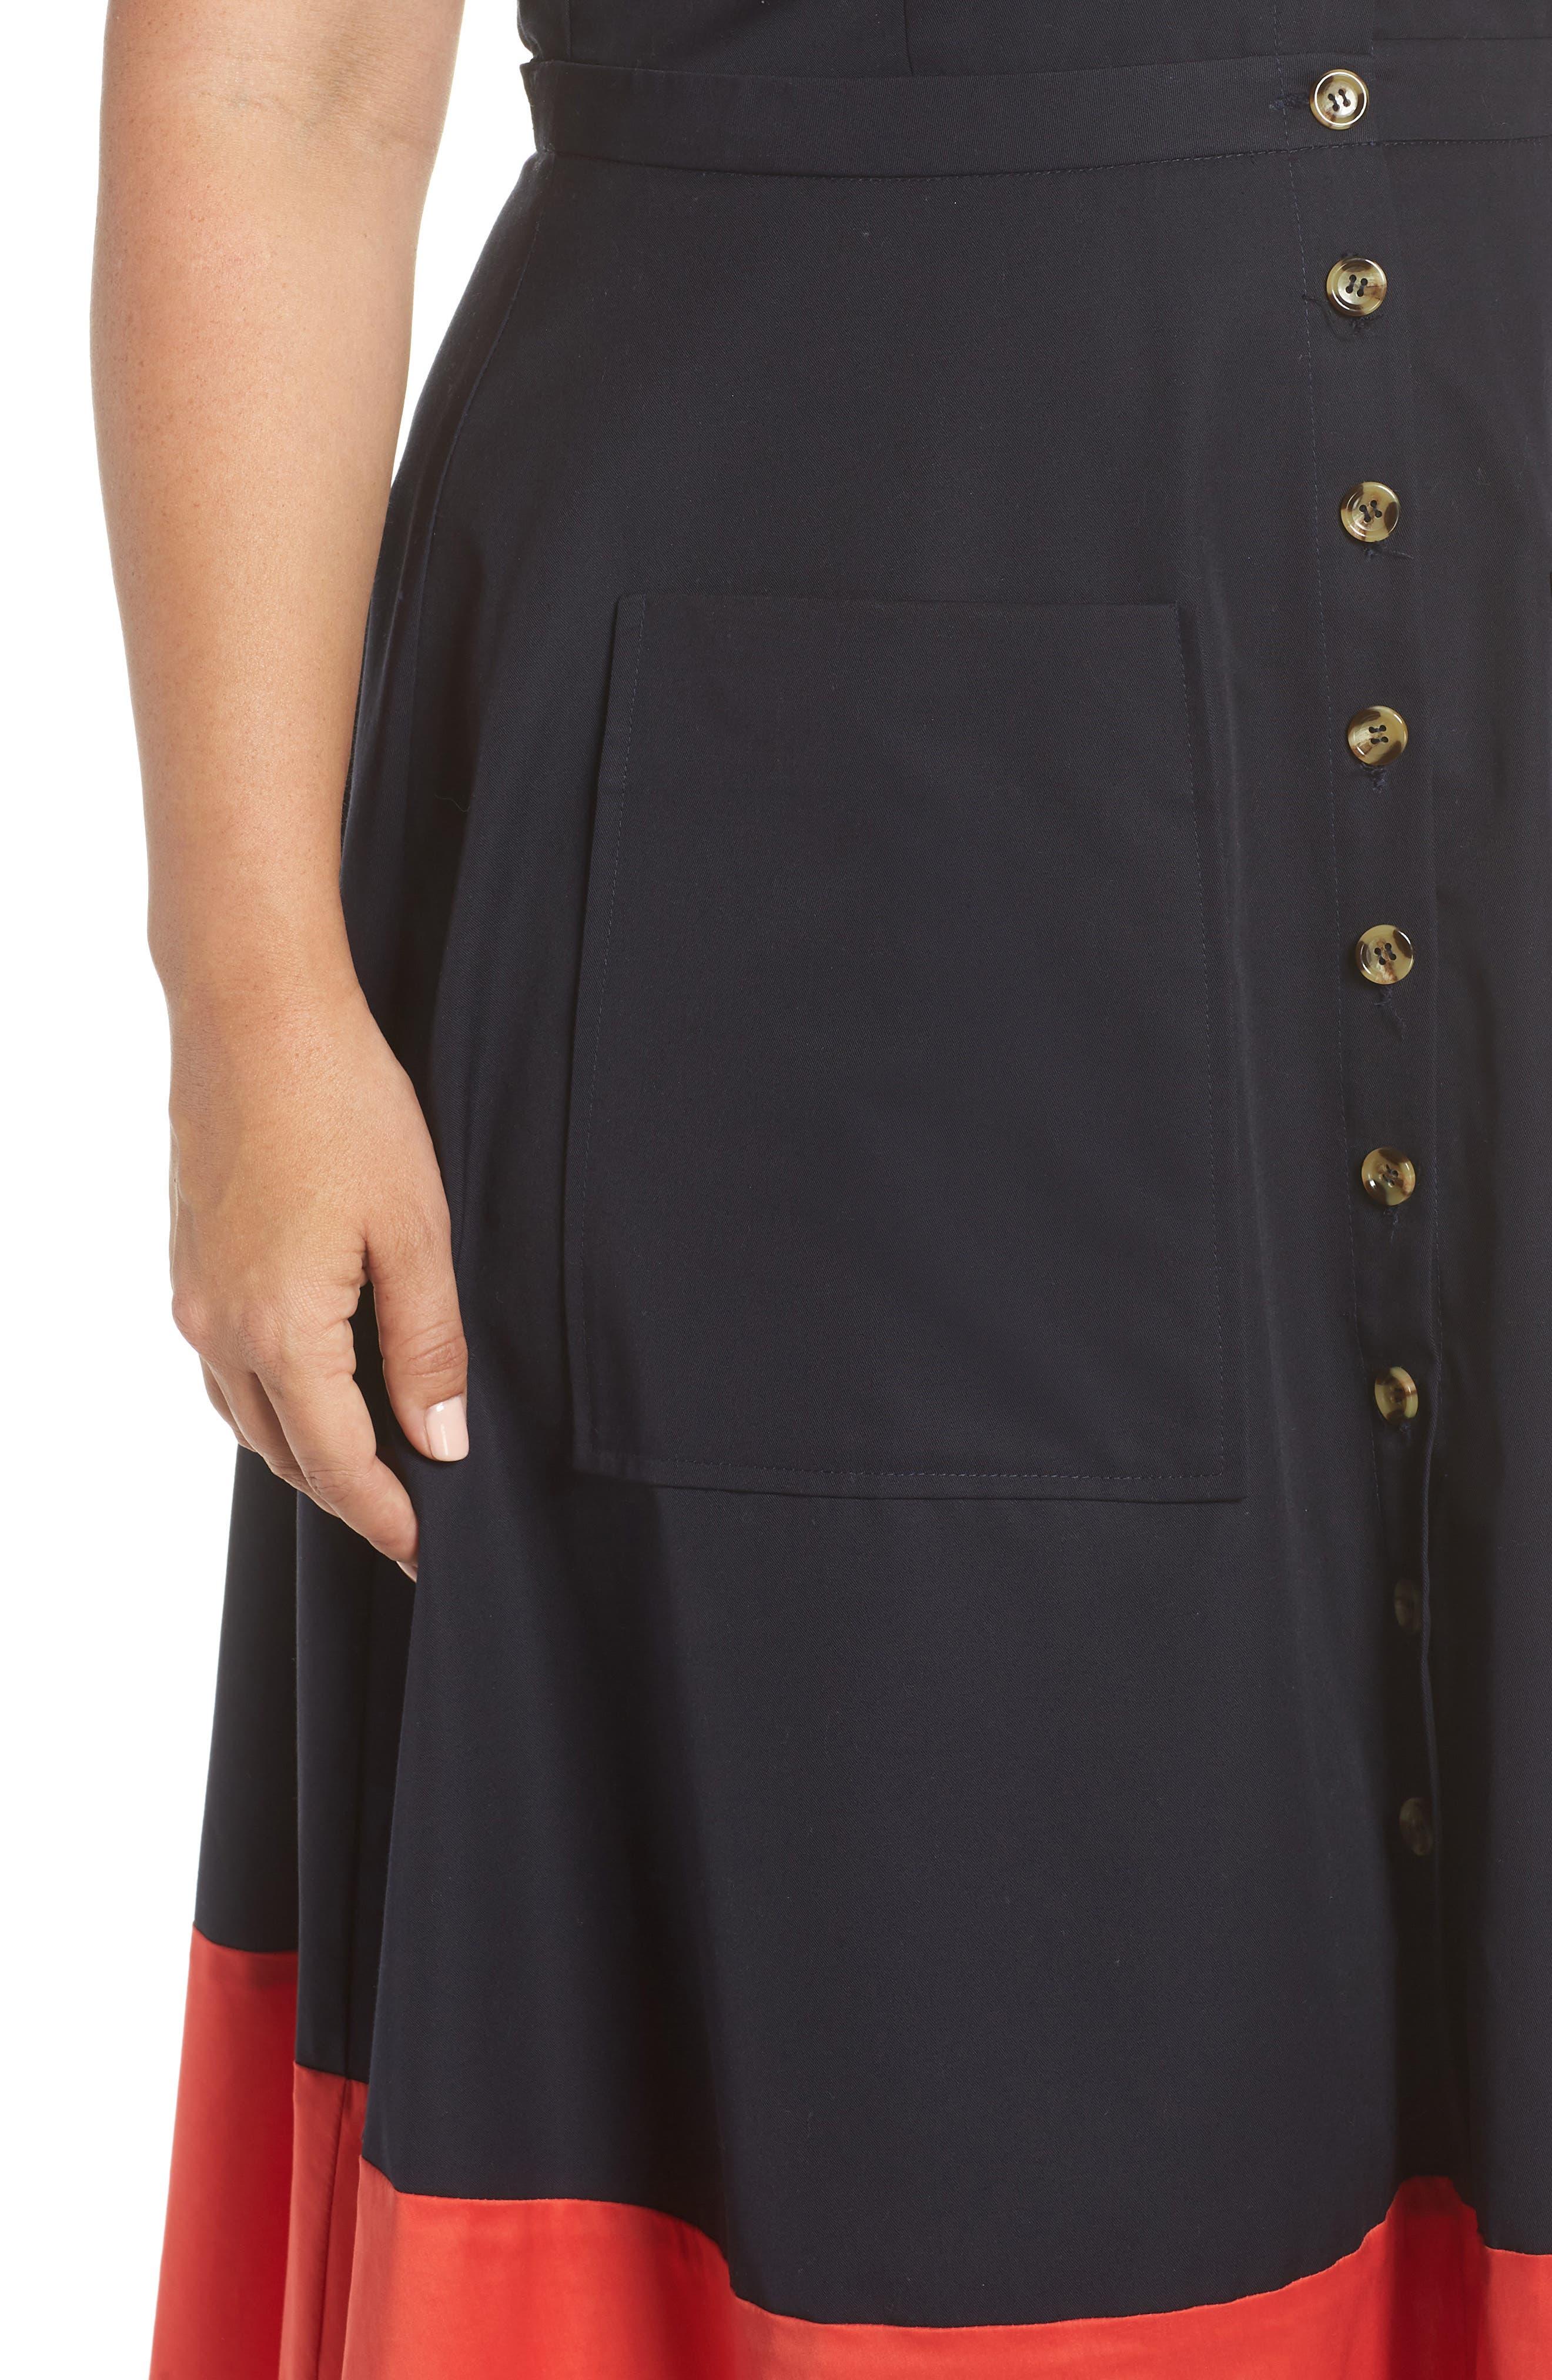 Colorblock Cotton Midi Dress,                             Alternate thumbnail 4, color,                             NAVY RED COLOR BLOCK